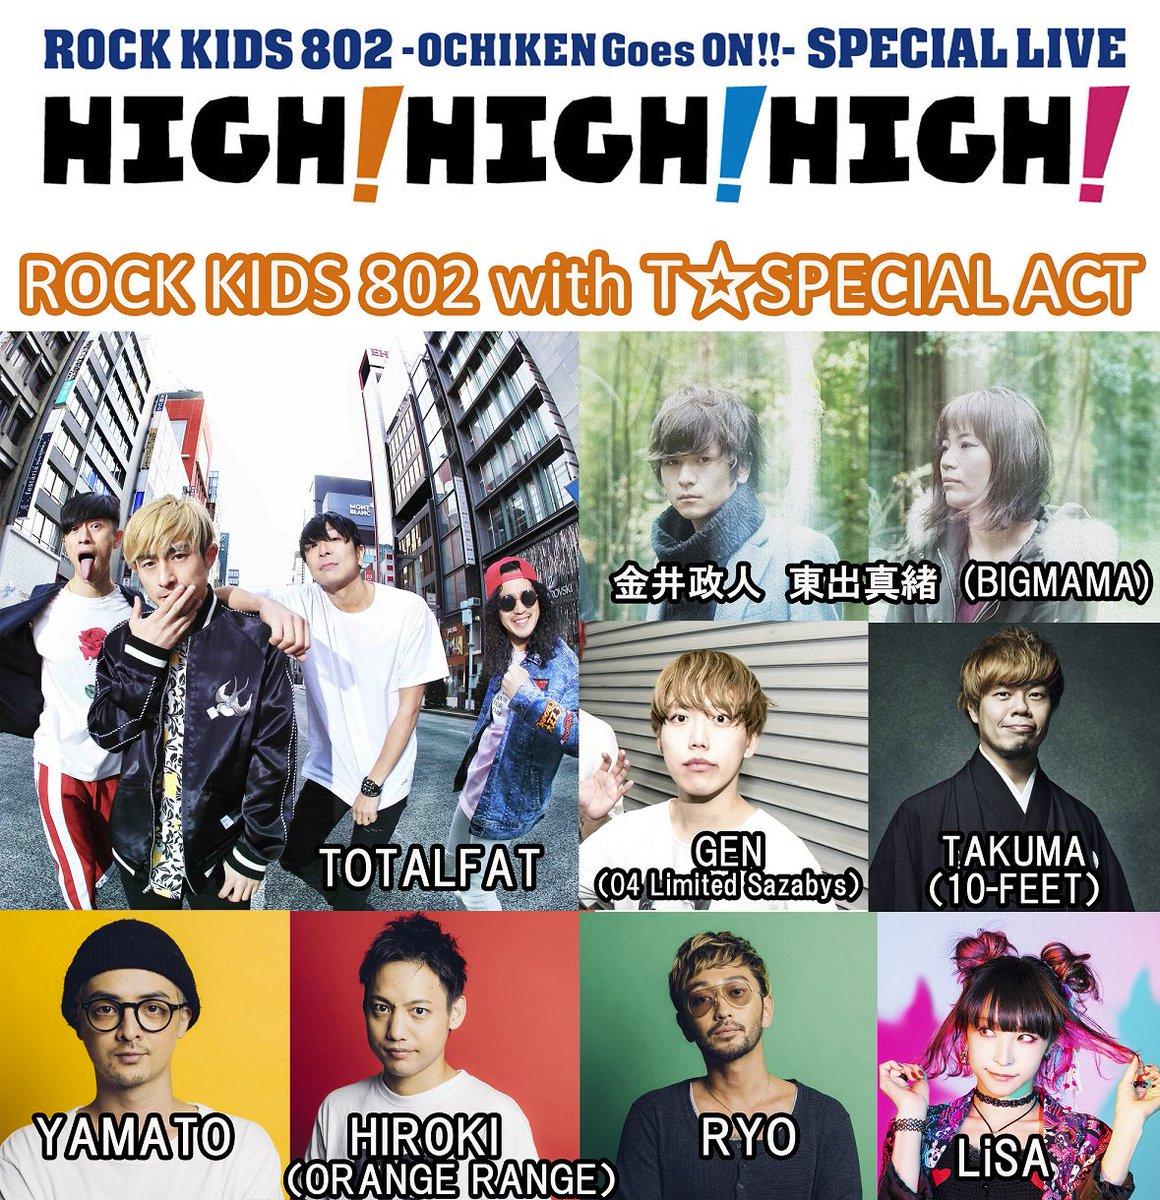 📻<ORANGE RANGE 「チラチラリズム」OA📡🌞🍍8/1🏯大阪城ホールで開催する #RK802 HIGH!×3🔥